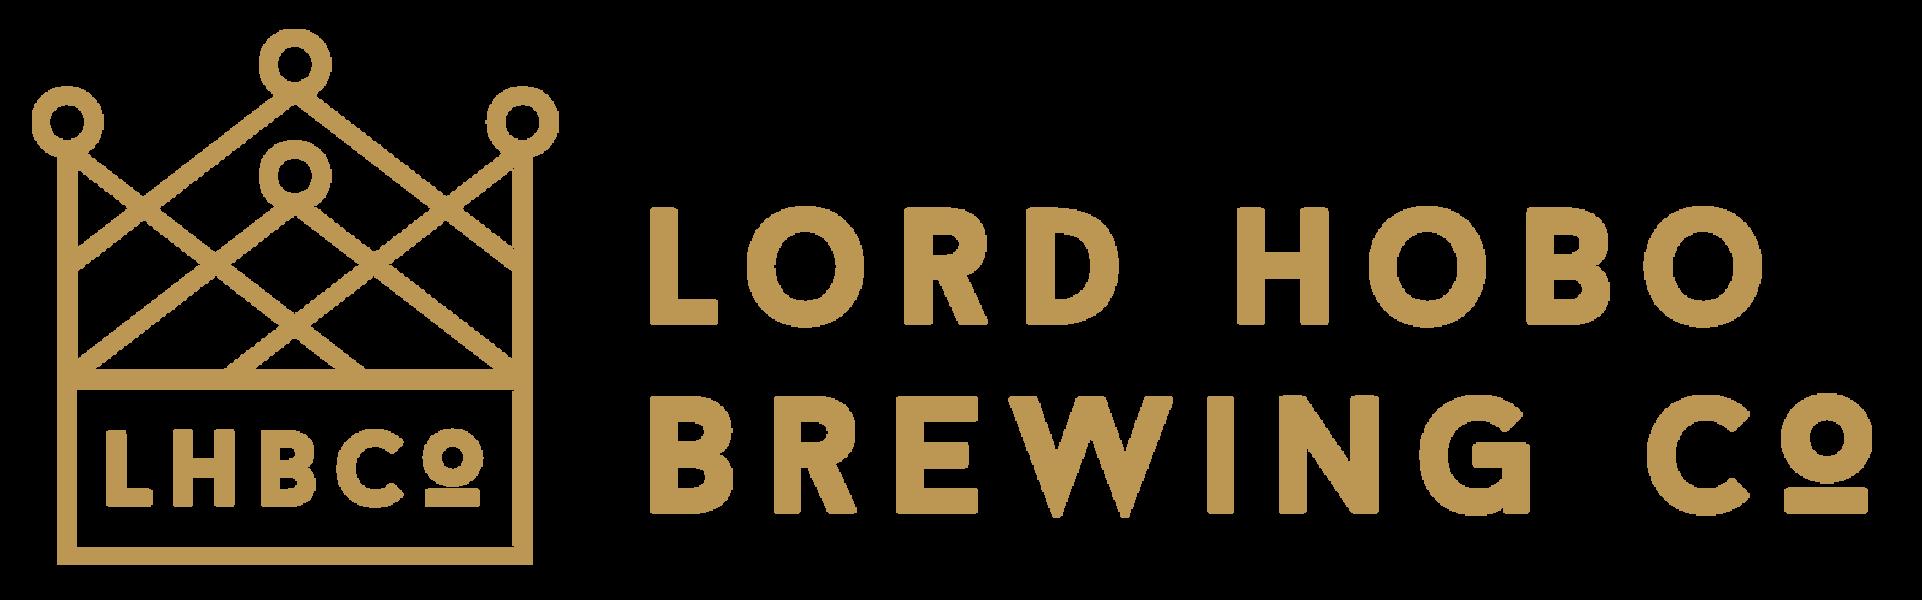 Lord Hobo